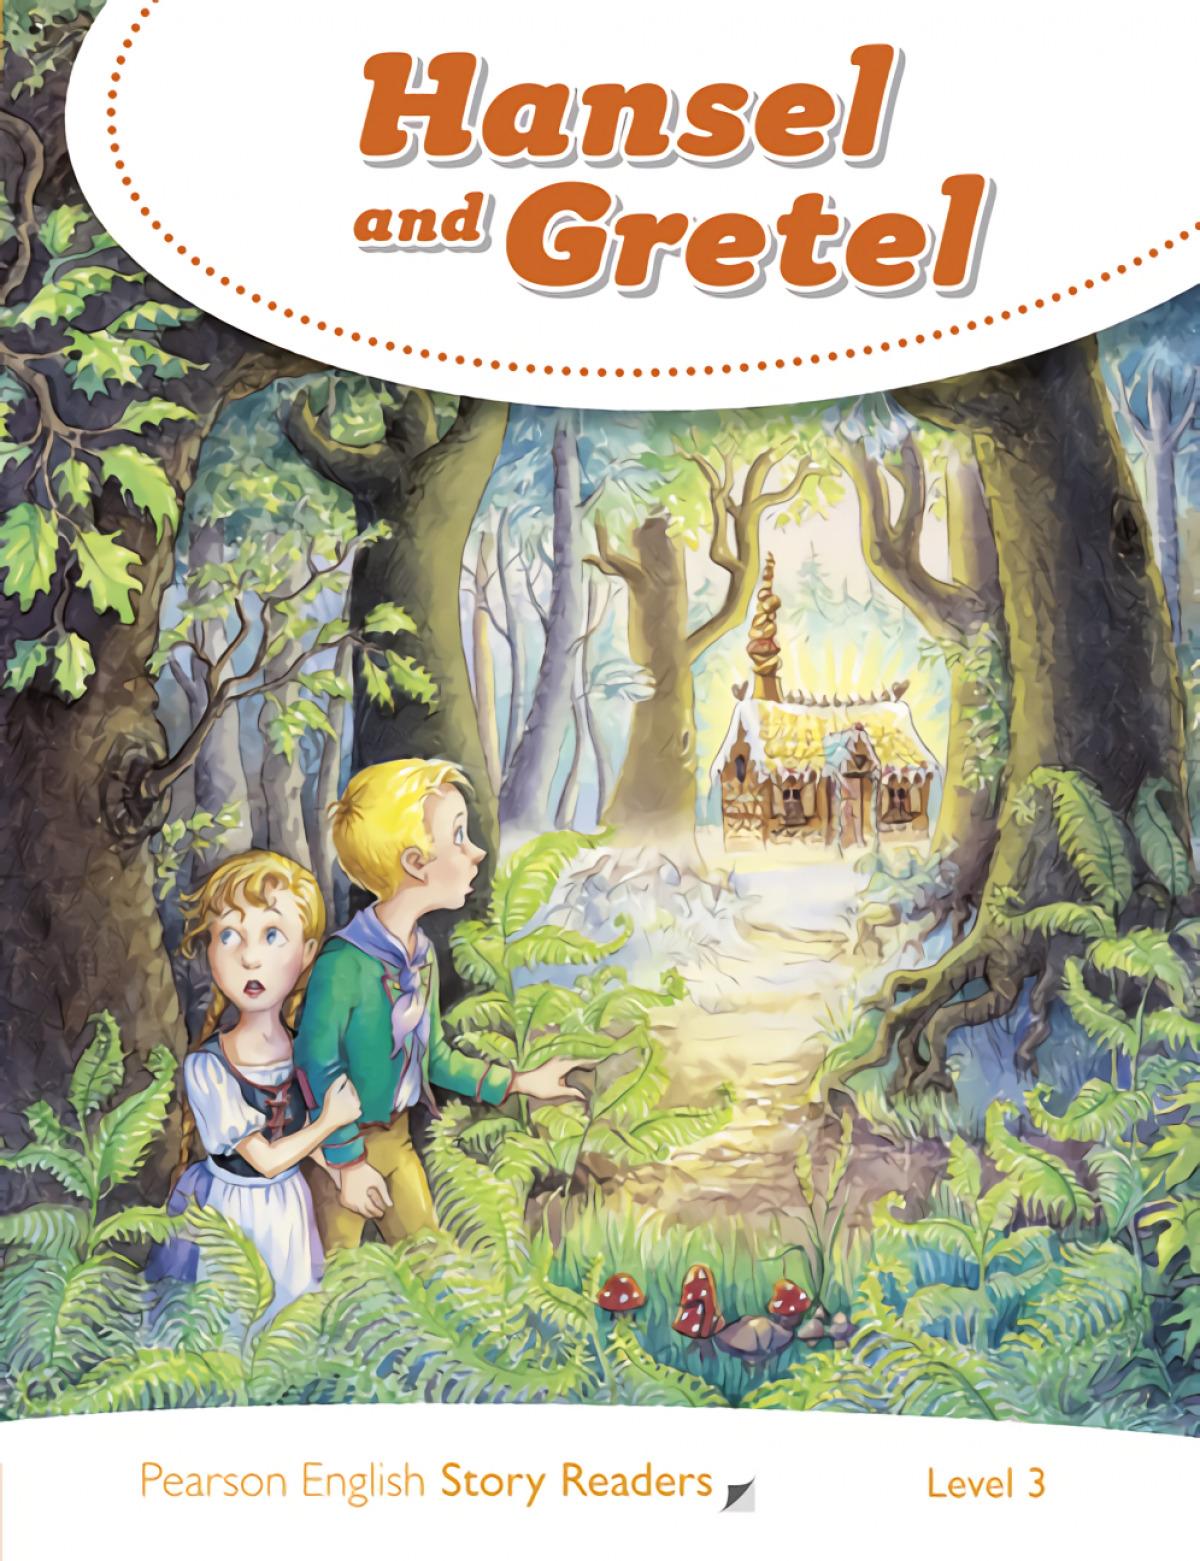 Level 3: Hansel and Gretel